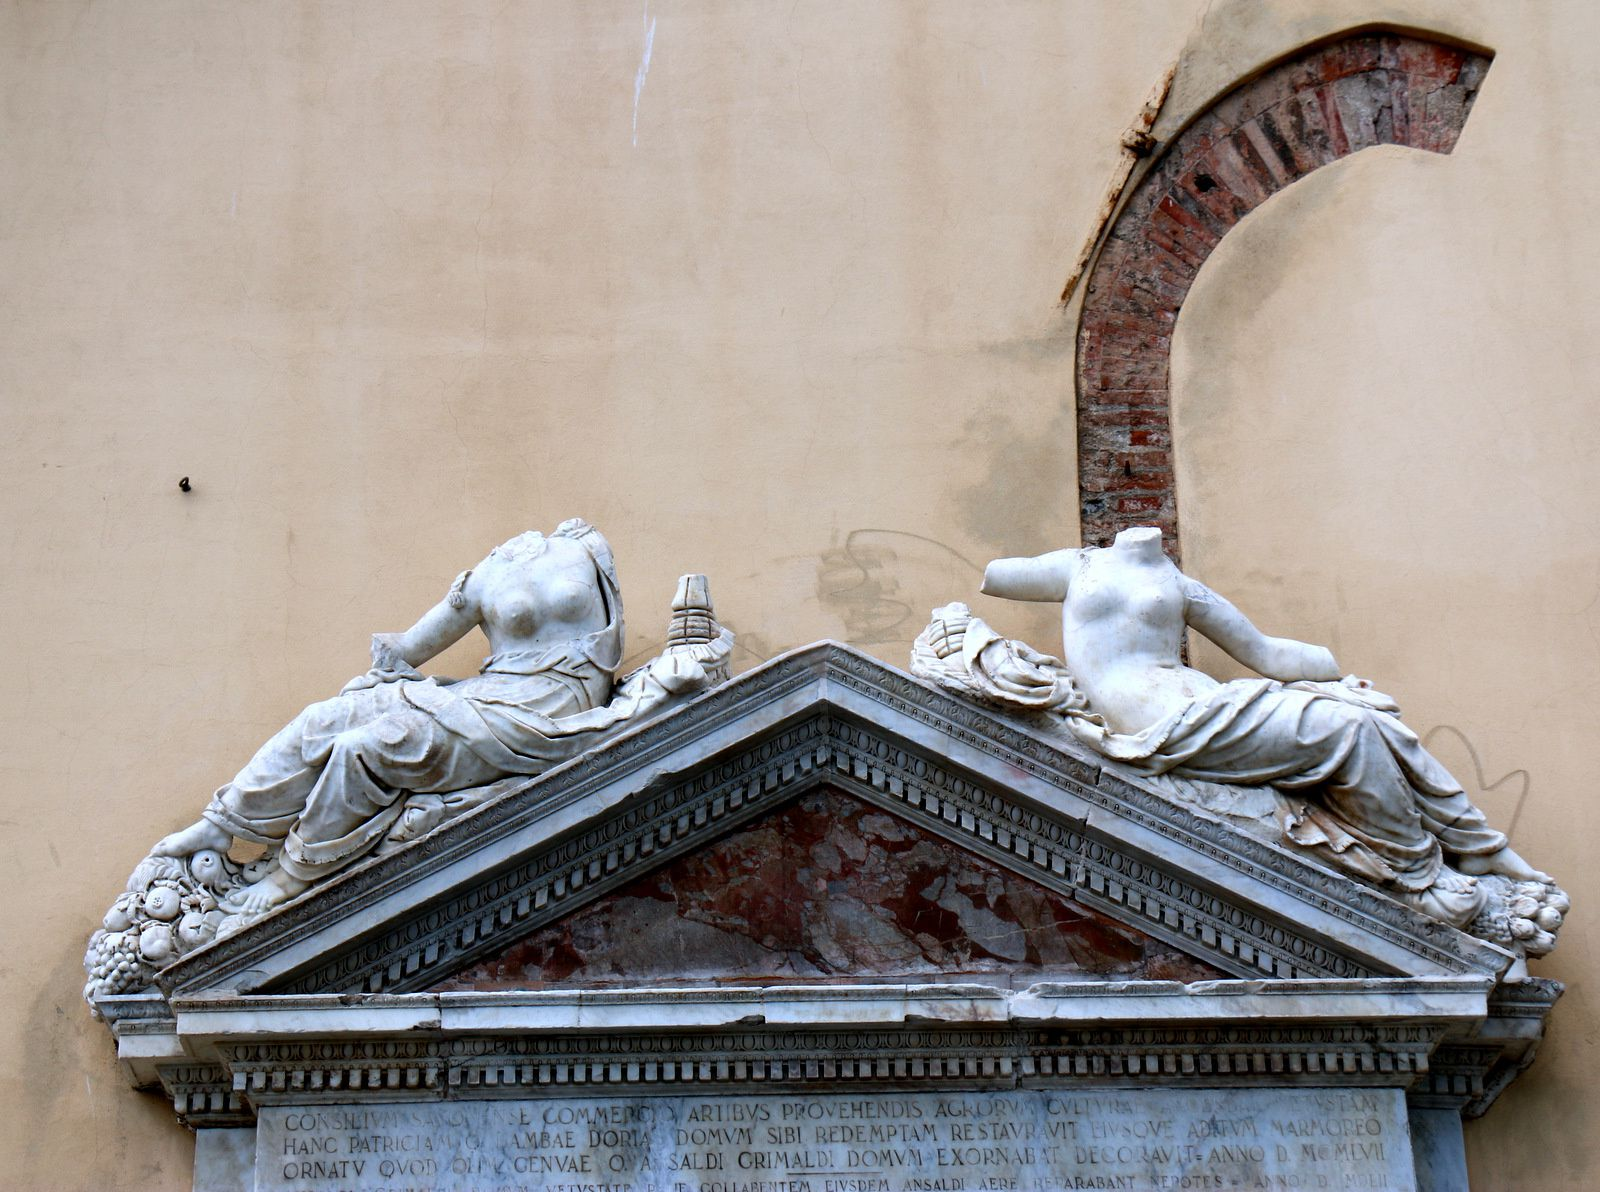 Eglise Sainte Lucie, Savone (Italie)